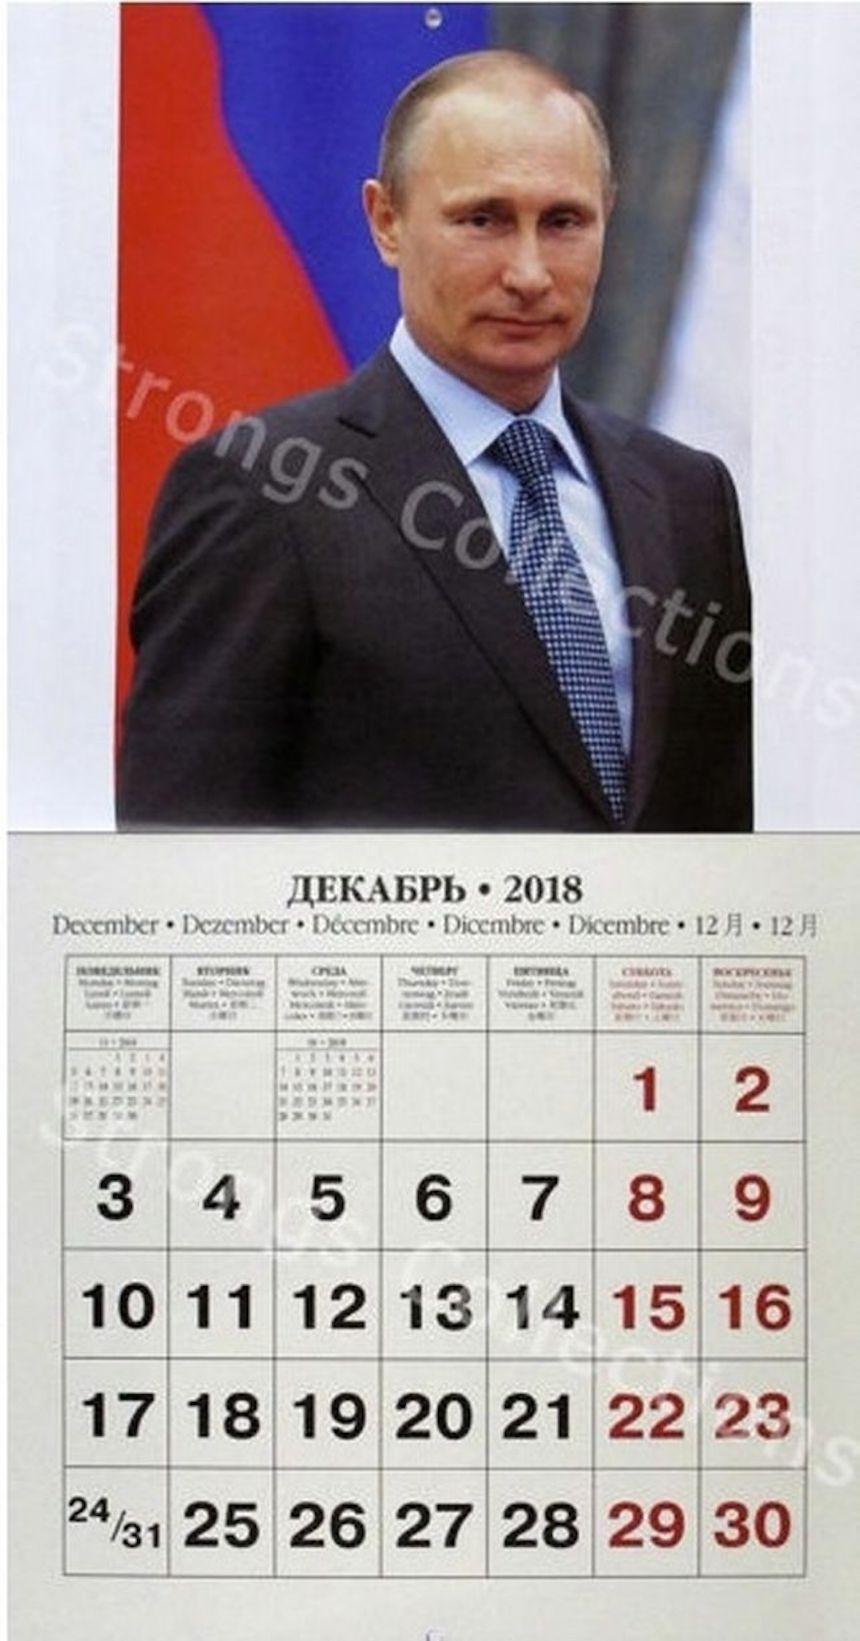 Calendario de Vladimir Putin 2018 - Formal